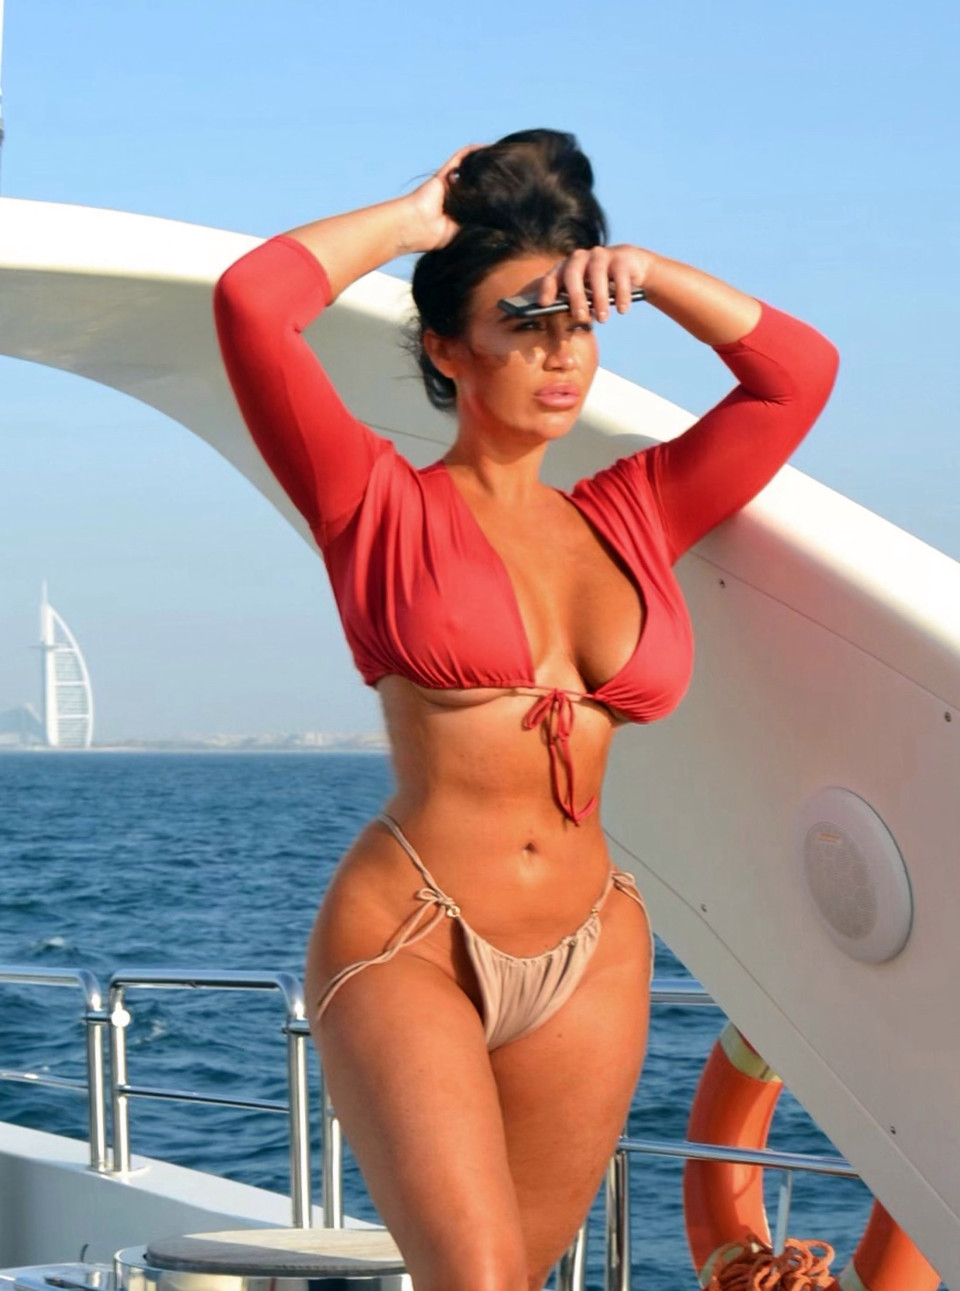 Lauren Goodger flaunts her bum in thong bikini on a luxury yacht in Dubai